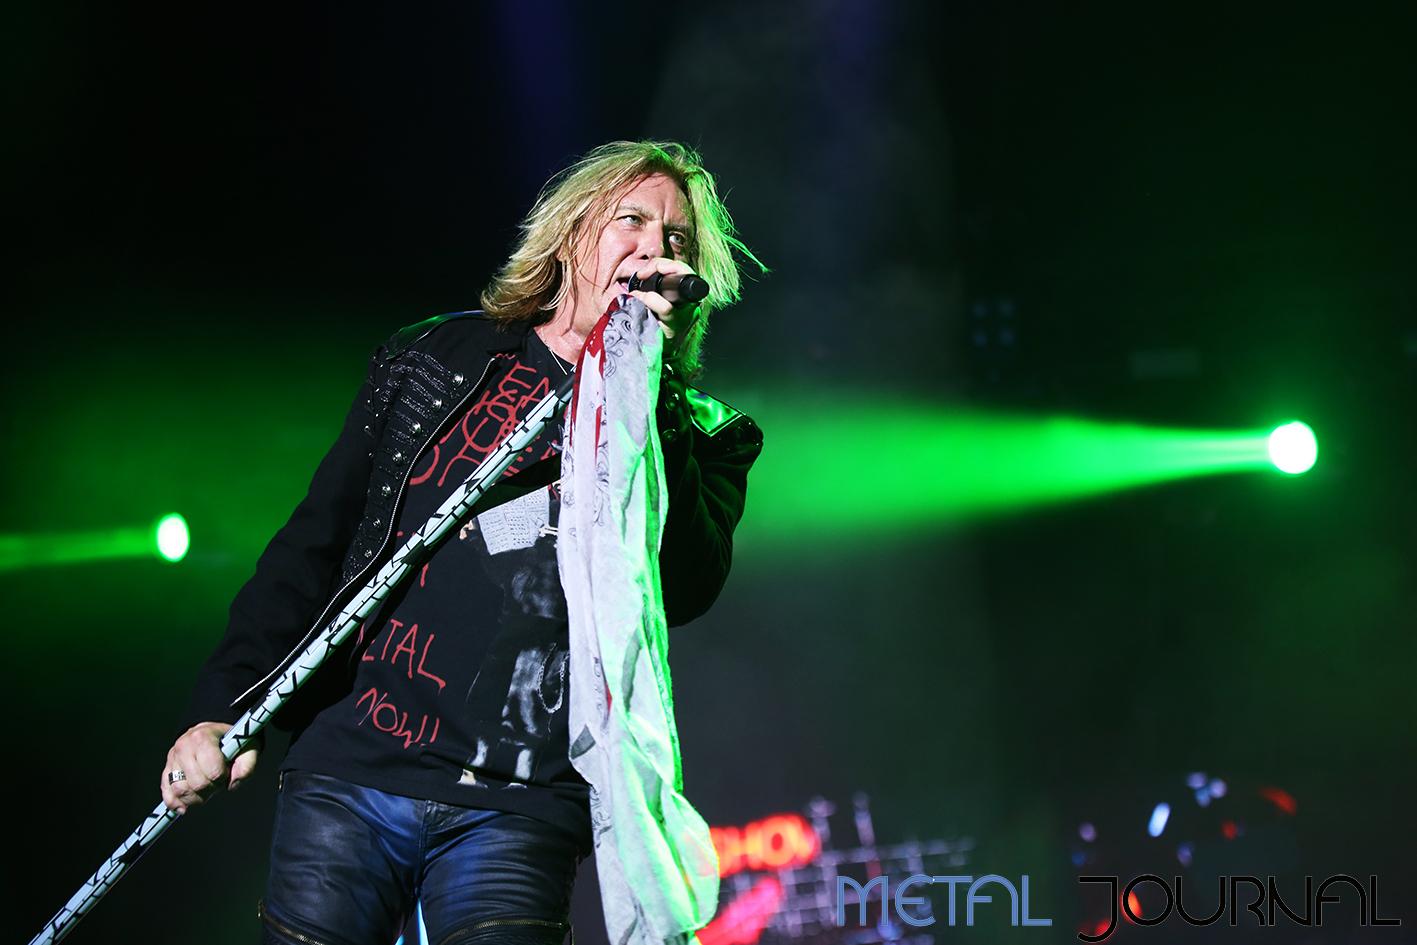 def leppard - metal journal rock fest barcelona 2019 pic 4